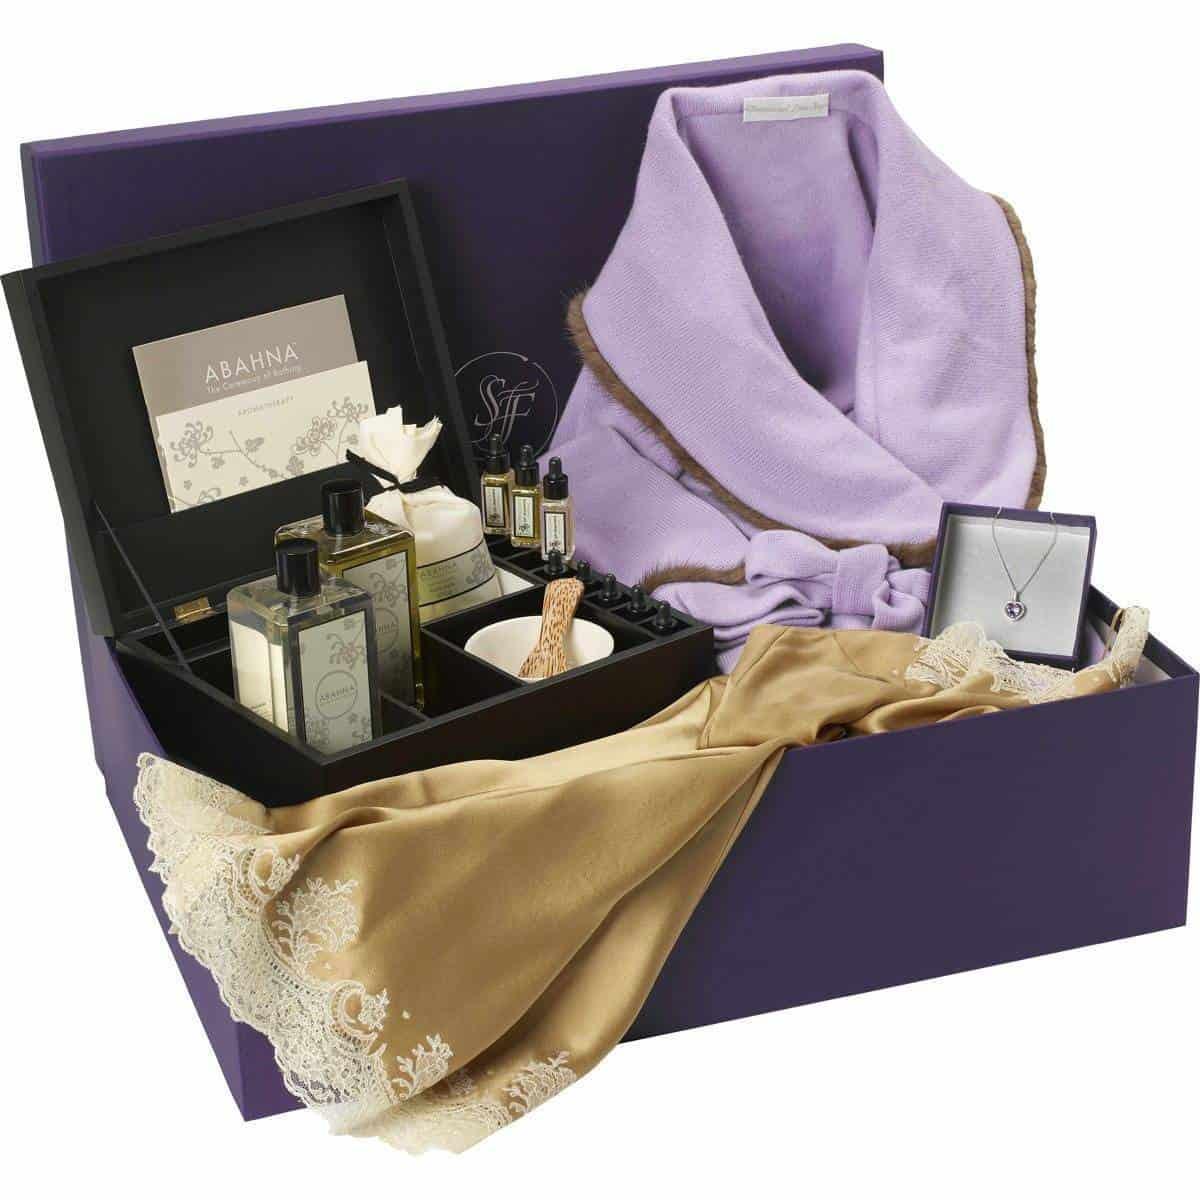 Luxury Wedding Gift Ideas: Luxury Wedding Gifts By Savoir Faire